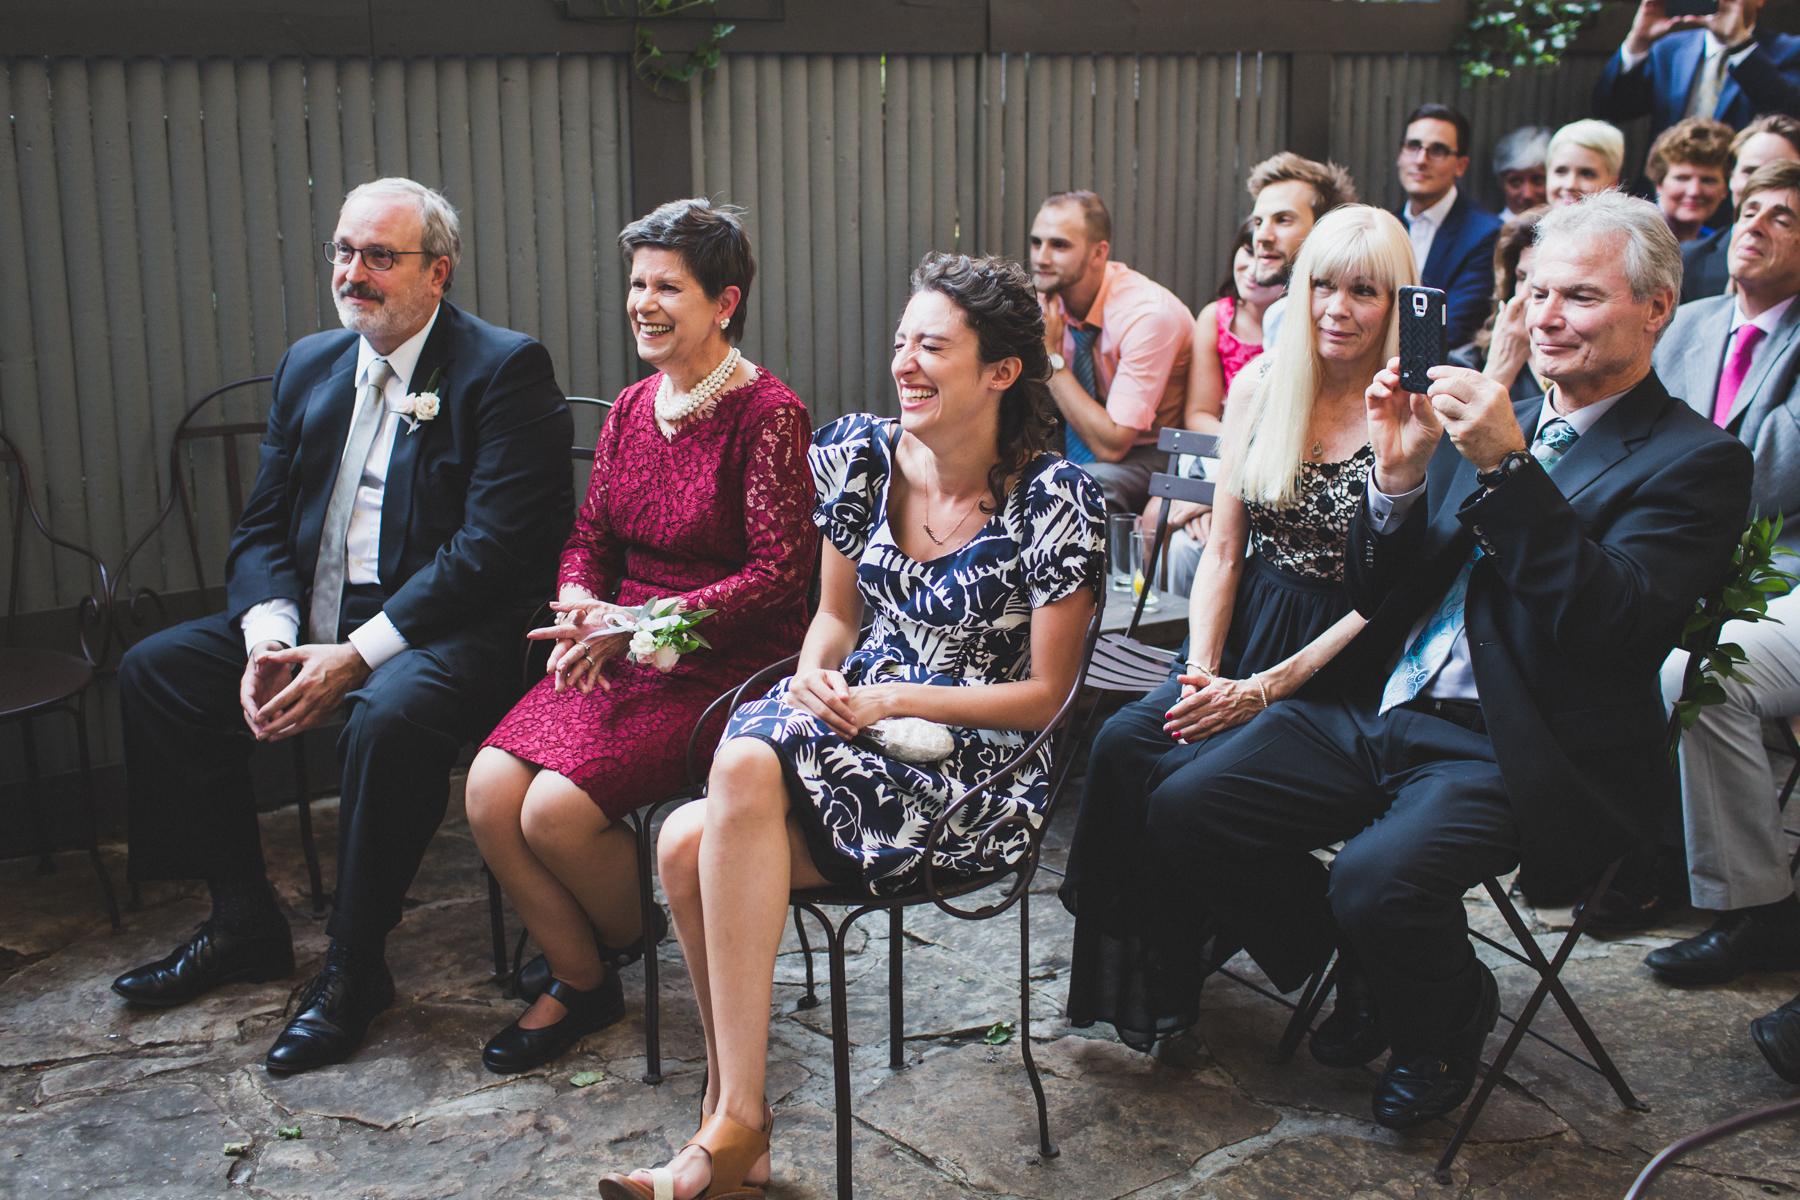 ICI-Restaurant-Fort-Greene-Brooklyn-Intimate-Documentary-Wedding-Photography-Elvira-Kalviste-41.jpg